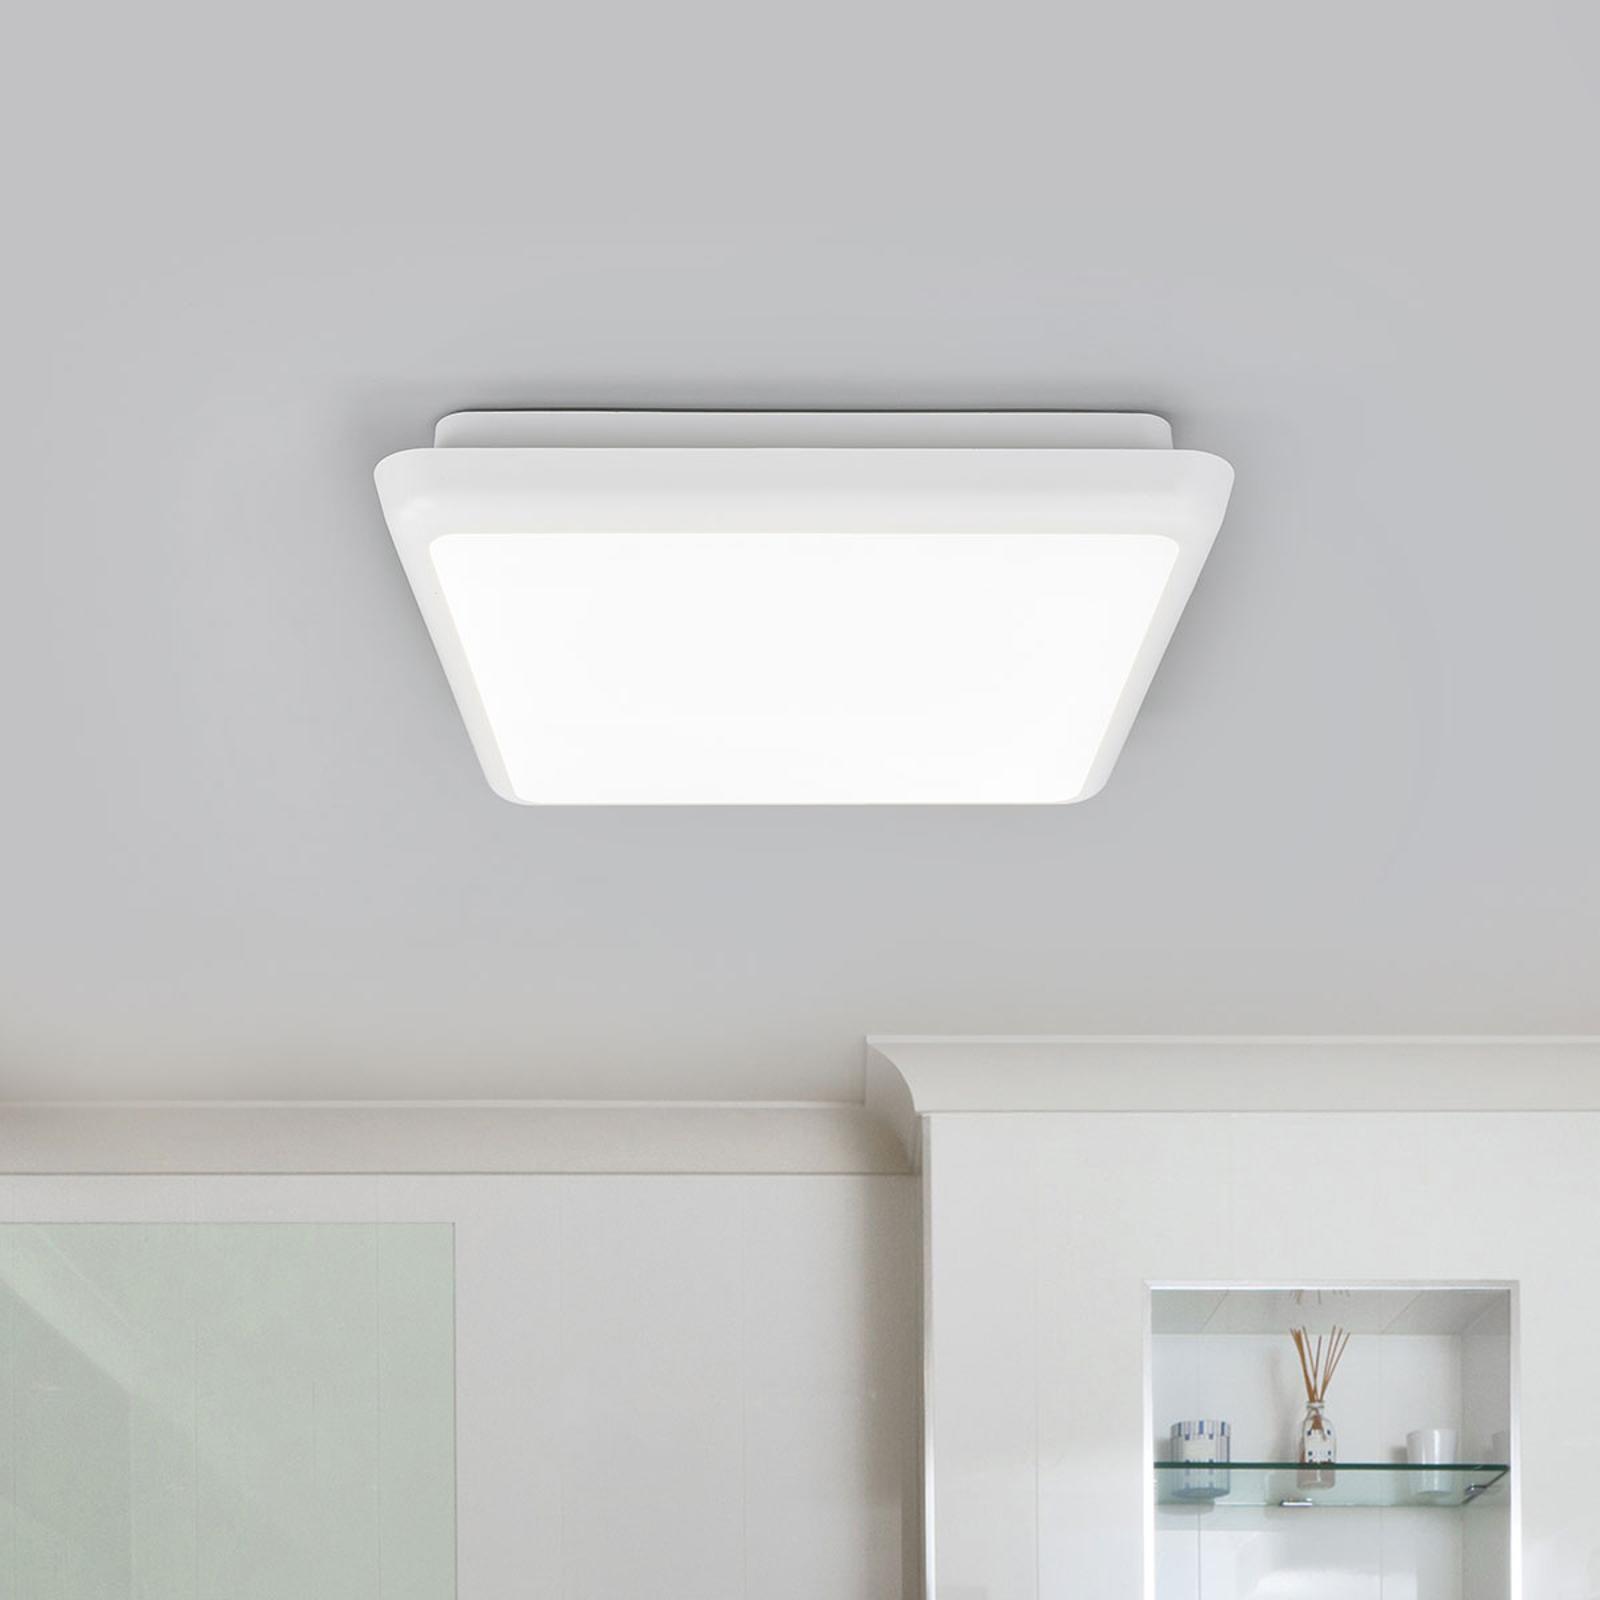 Plafonnier LED carré Augustin, 25 cm